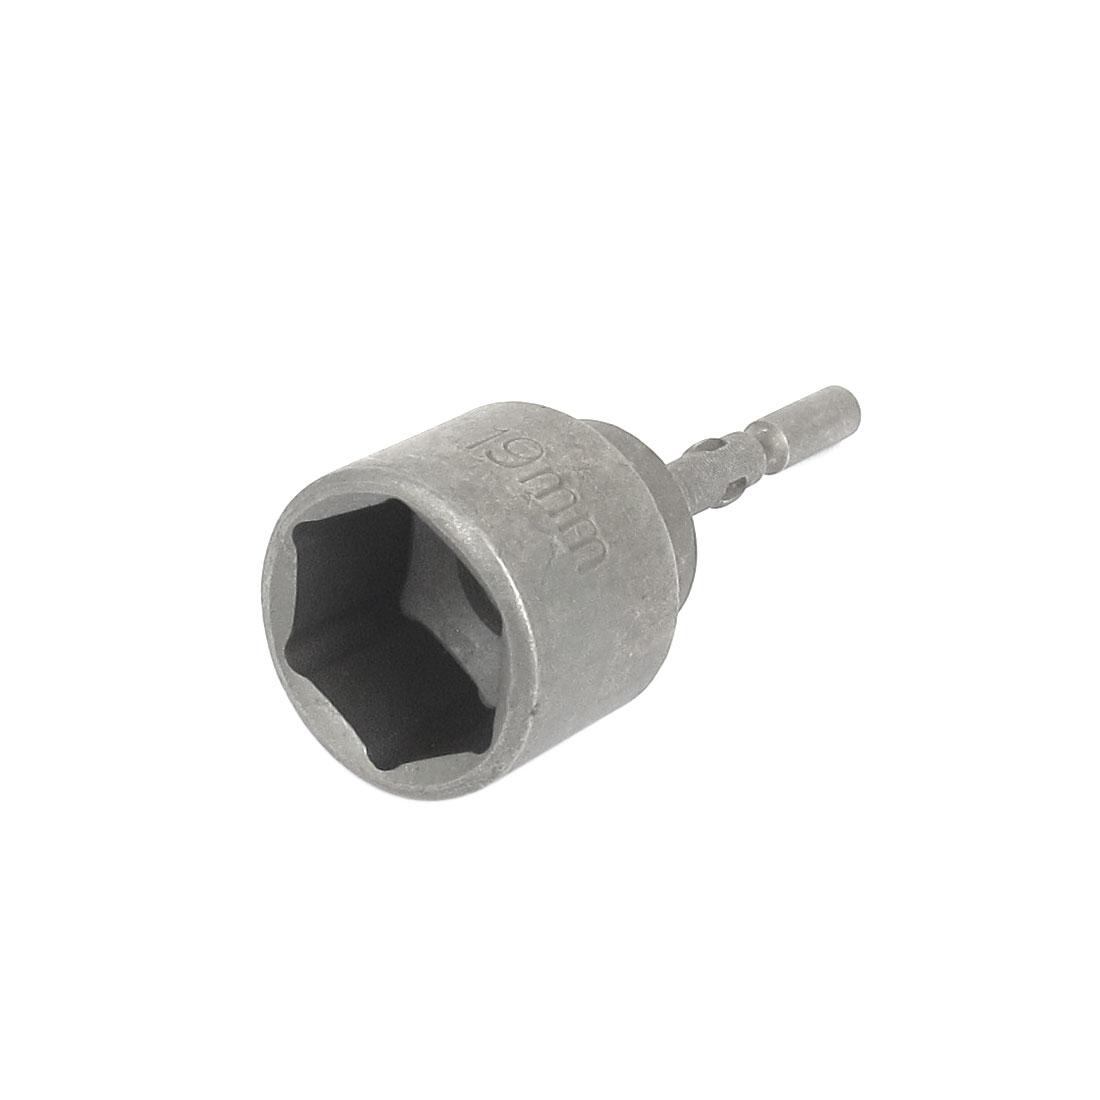 5mm Round Shank 19mm Hex Socket Spanner Nut Setter Driver Bit Power Drill Tool